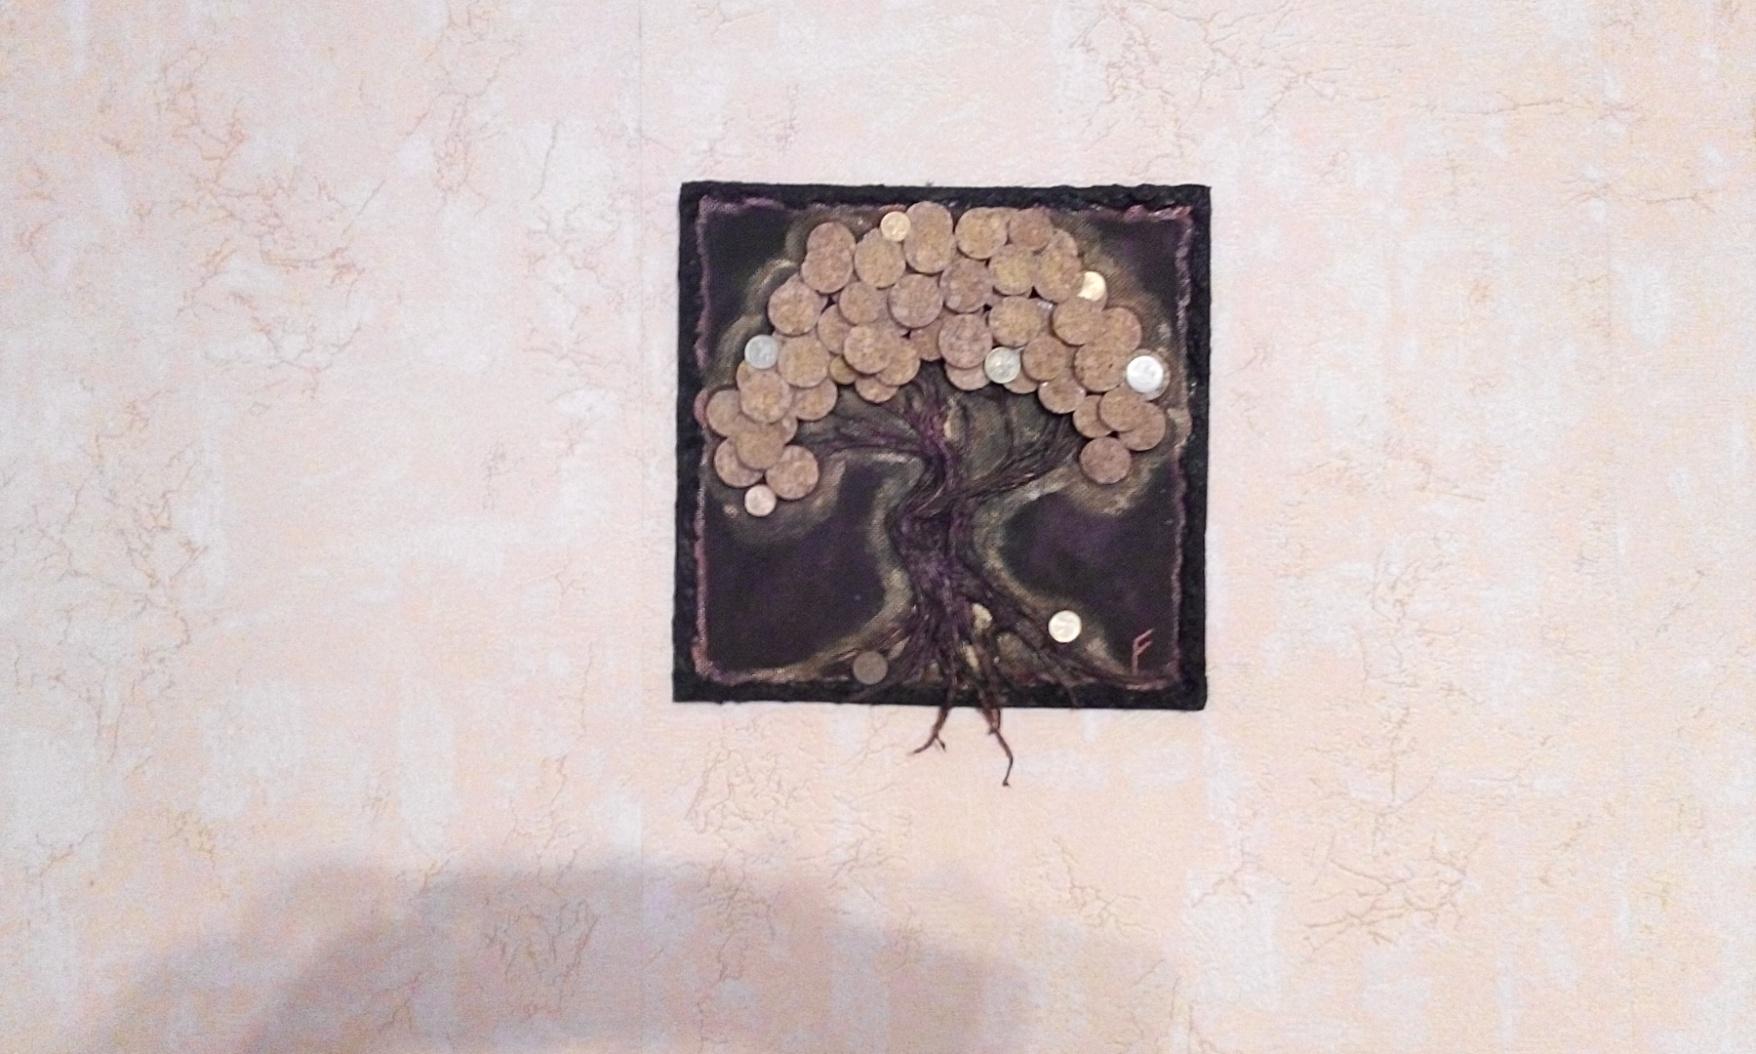 D:\ДЛЯ САЙТА\МК денежное дерево\IMG_20150928_170958.jpg